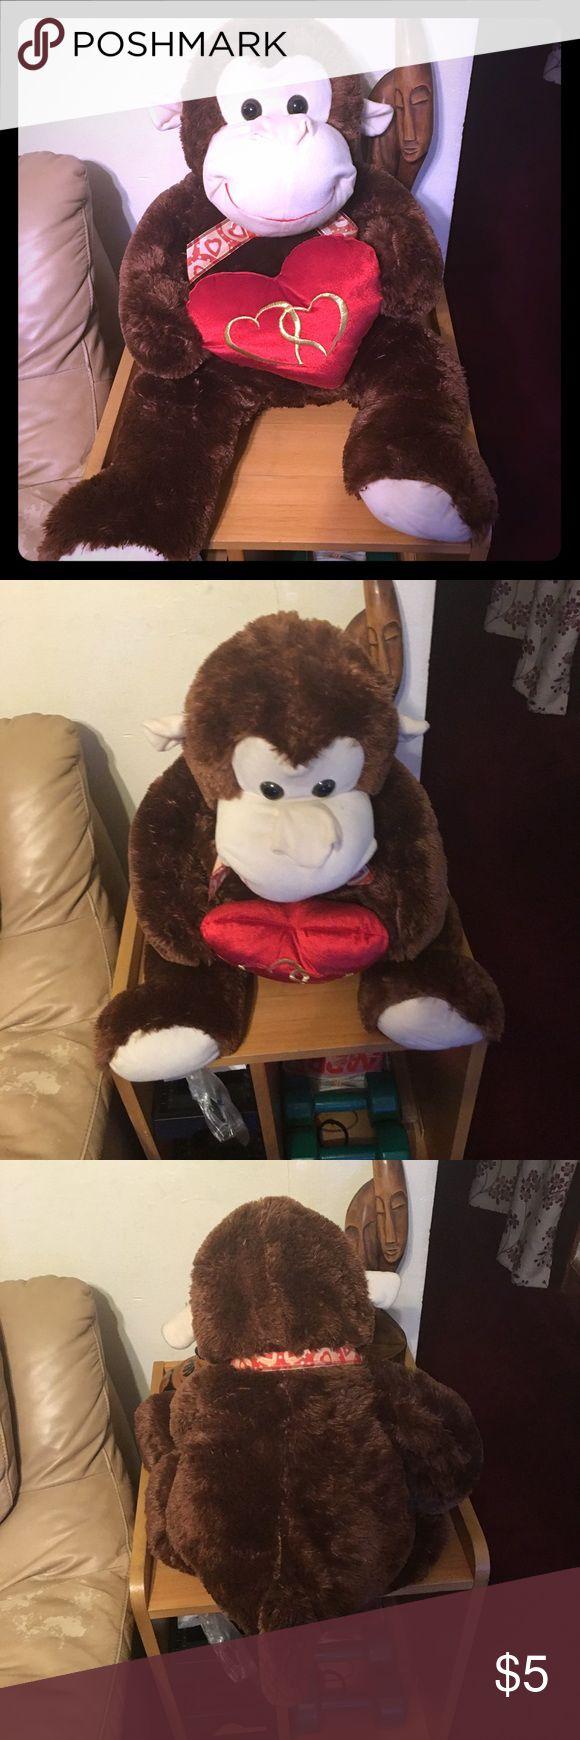 ef1194f8efd7c2935090d51a688aa4a3 a child monkey